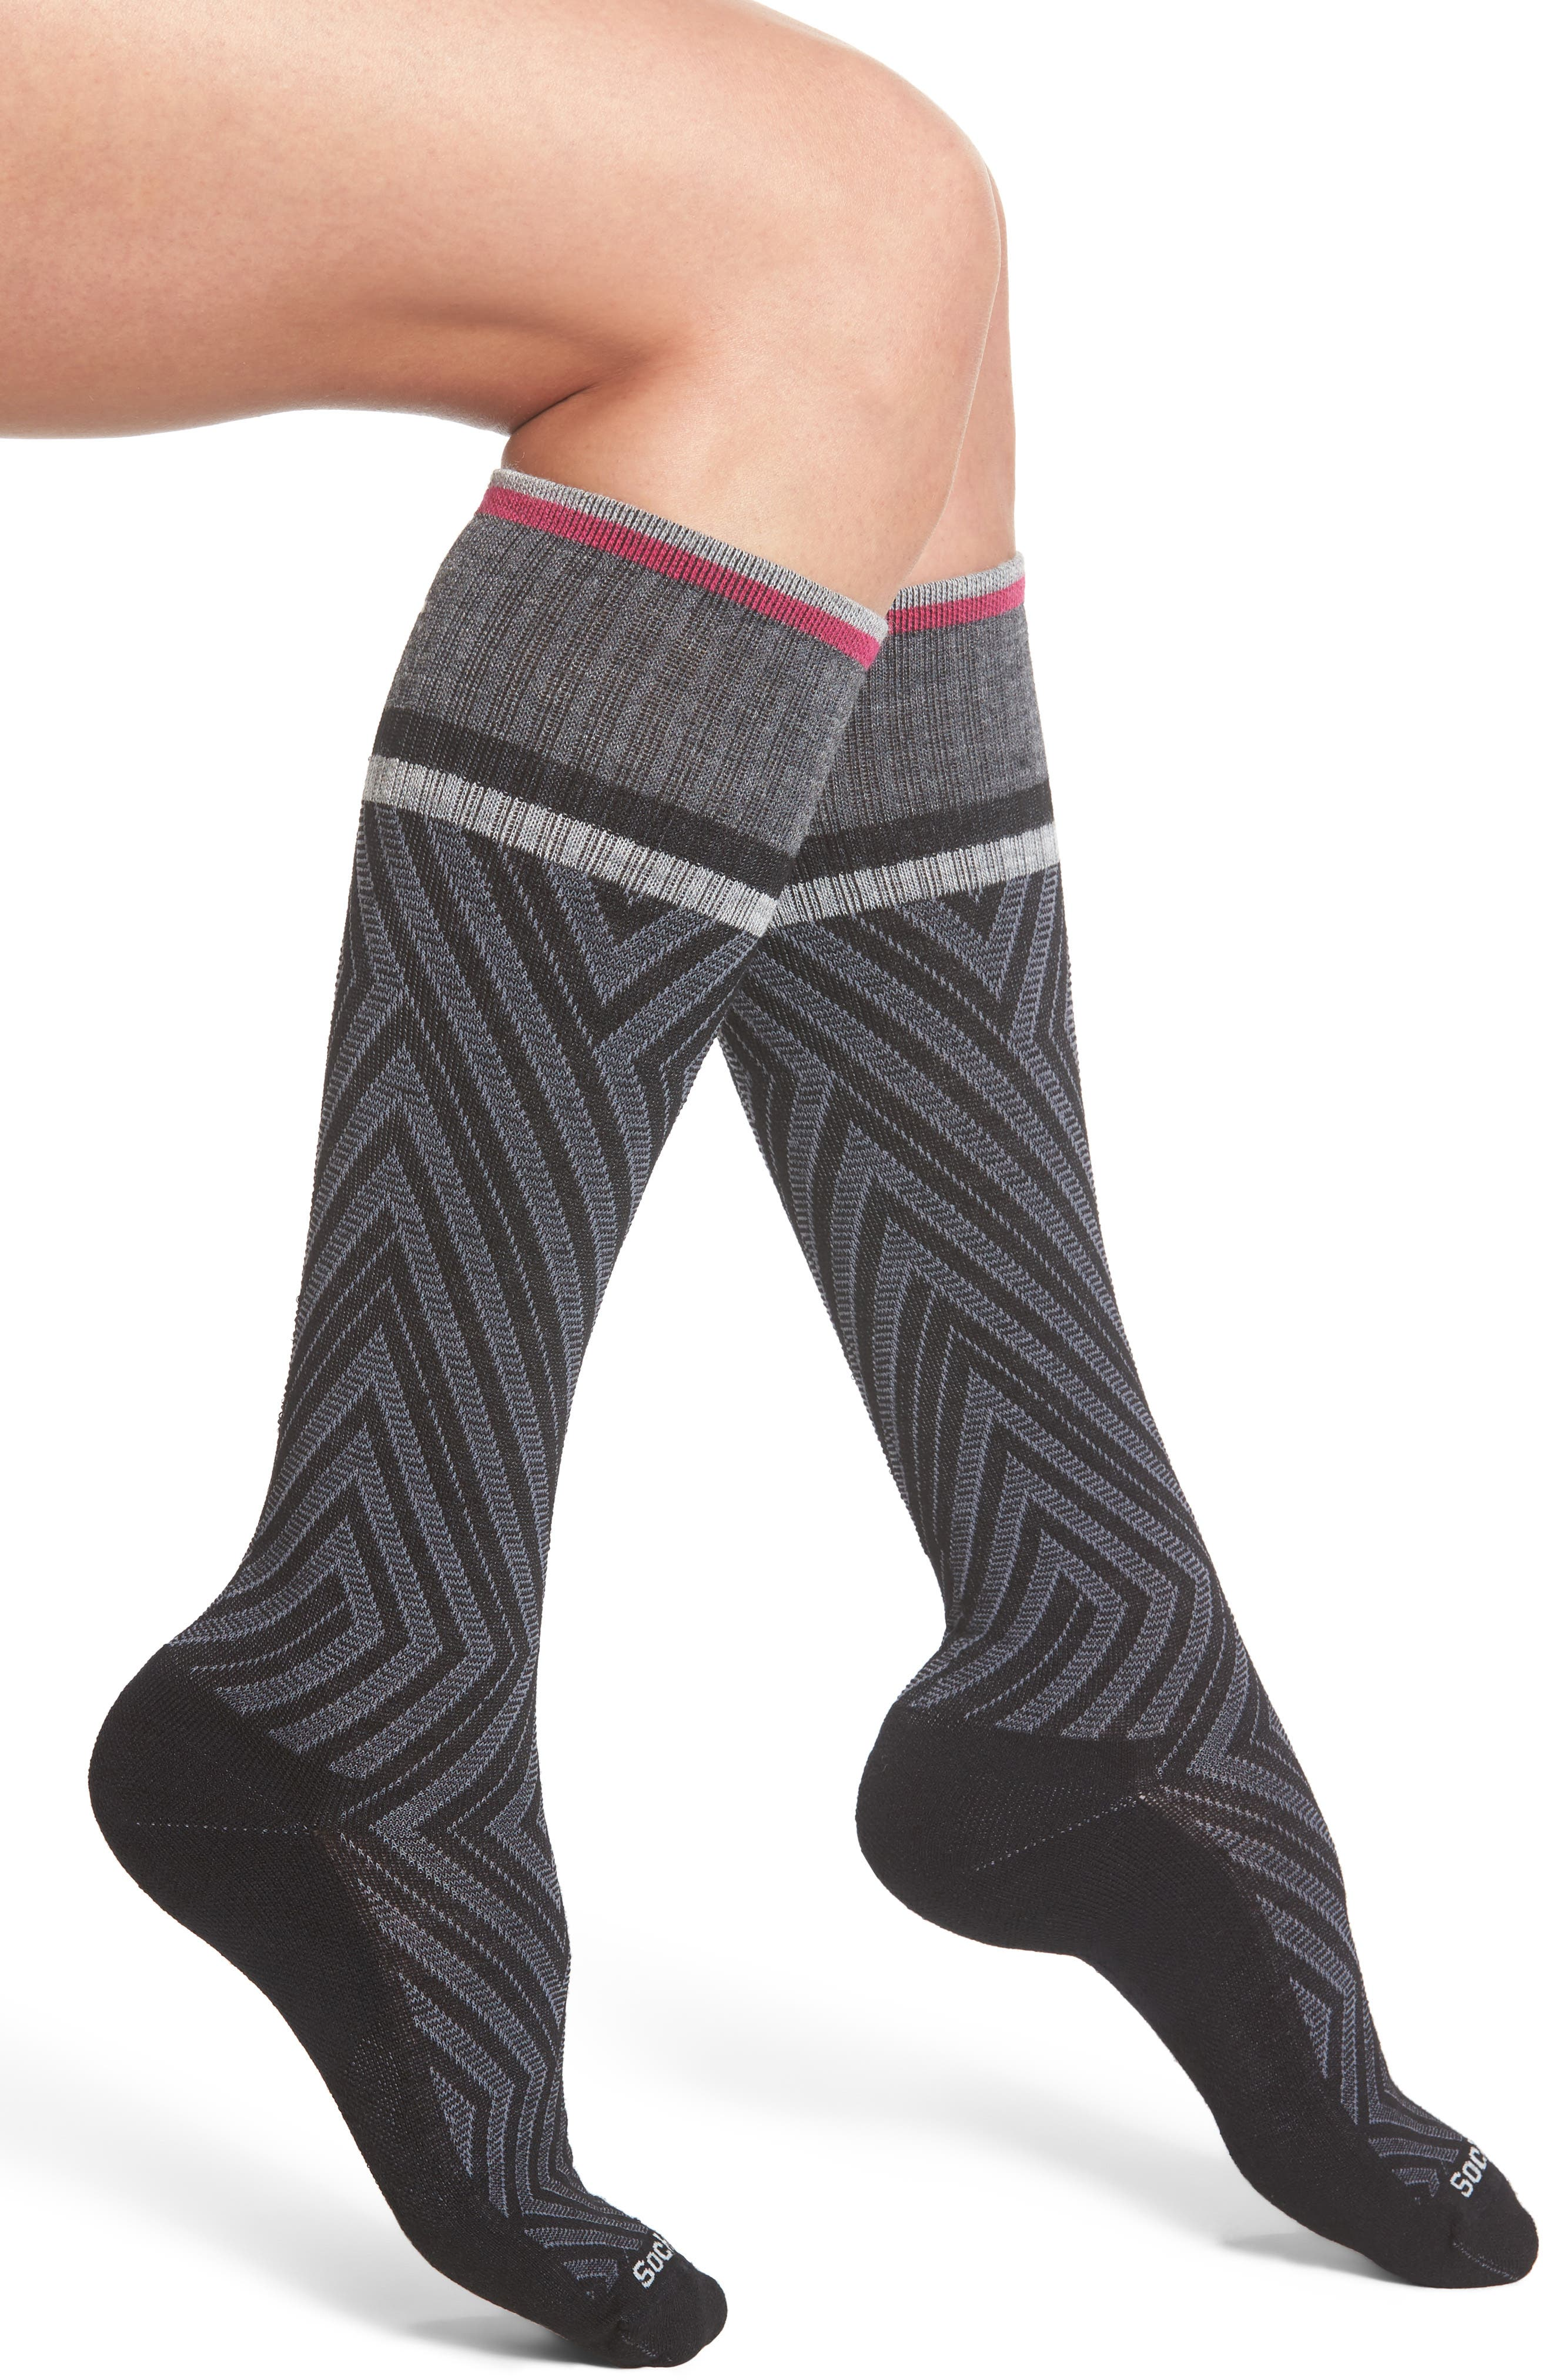 Labyrinth Graduated Compression Socks,                             Main thumbnail 1, color,                             001